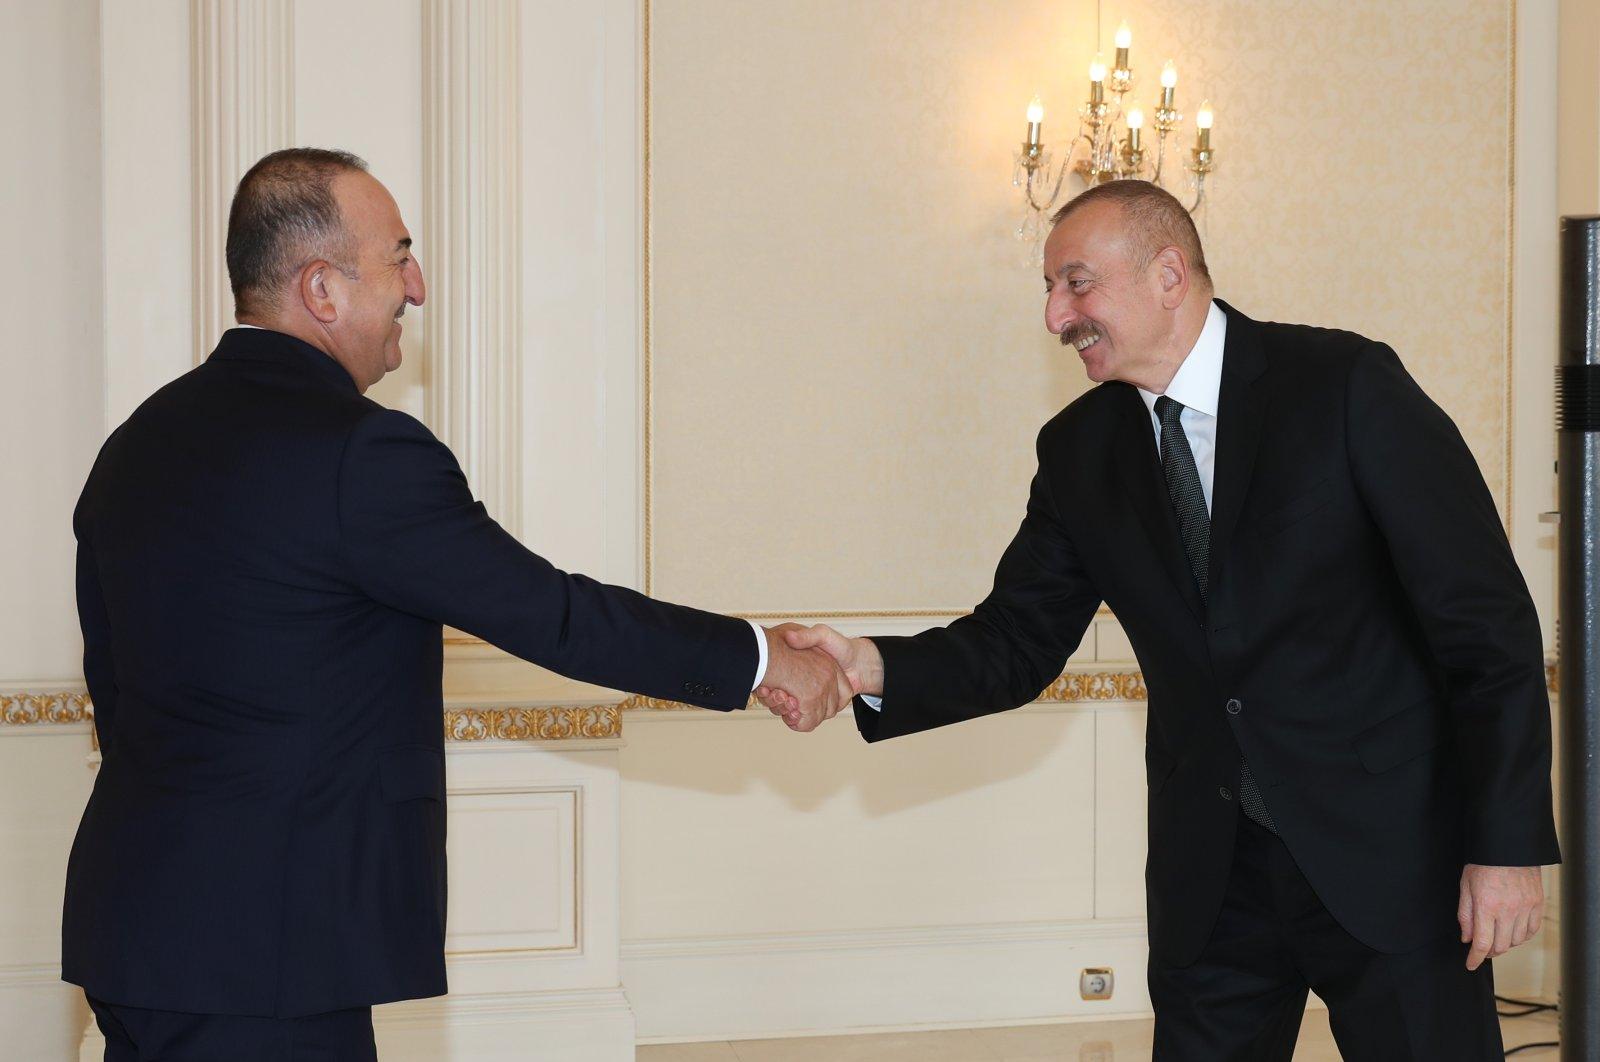 Foreign Minister Mevlüt Çavuşoğlu meets with Azerbaijan's President Ilham Aliyev during an official visit to Baku, Azerbaijan, Nov. 1, 2020. (AA Photo)